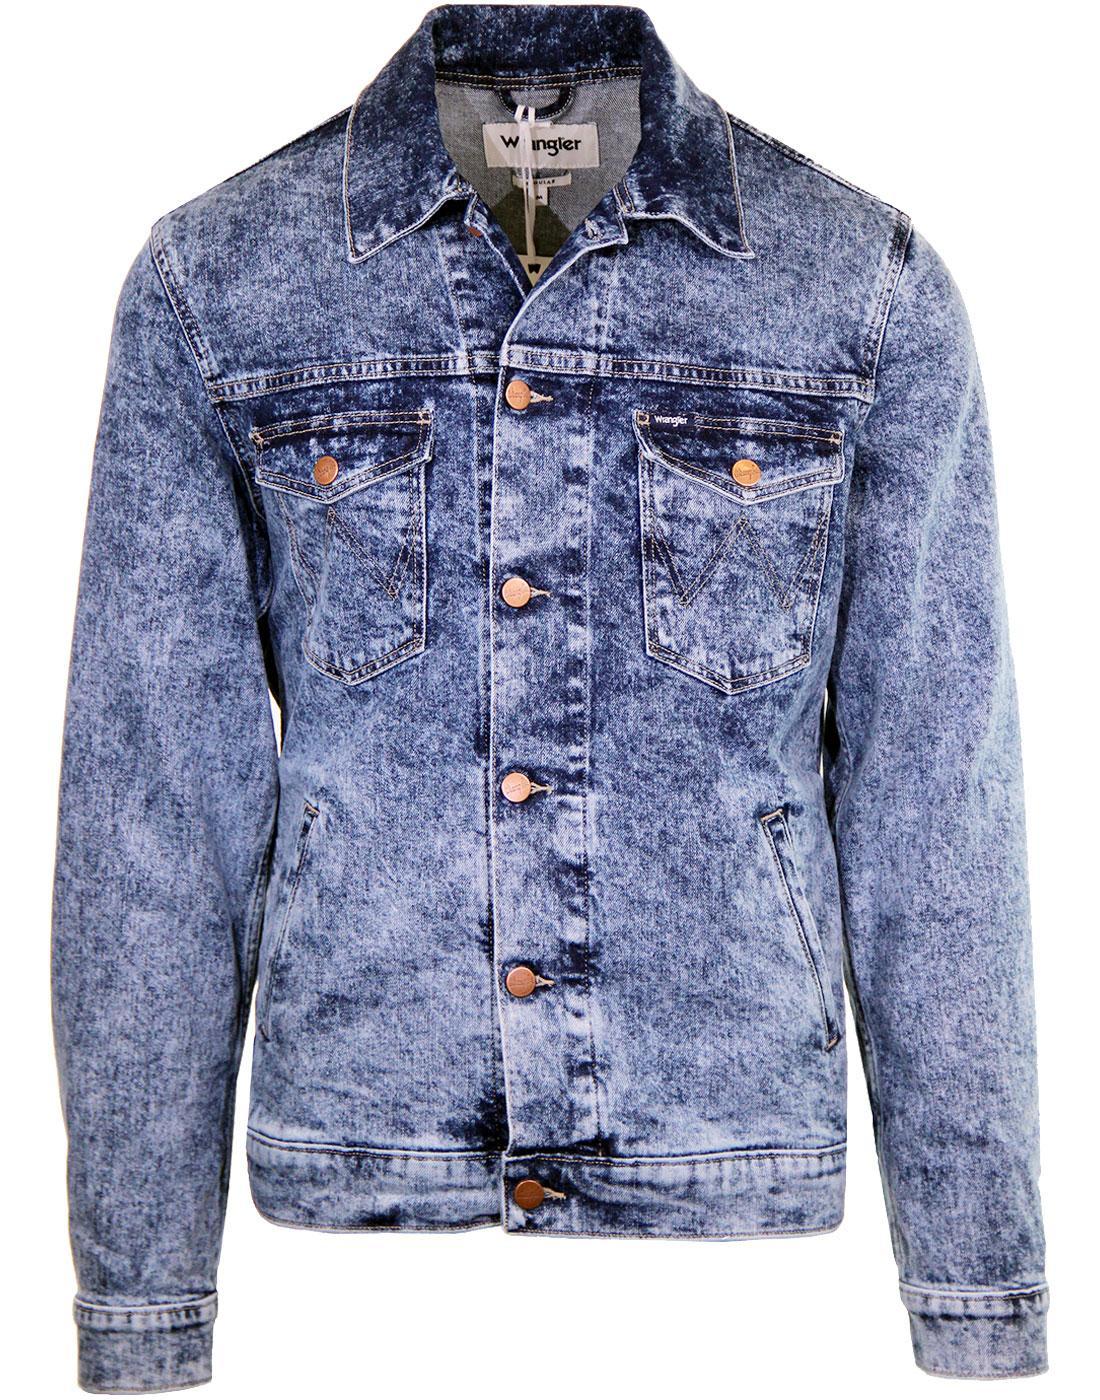 WRANGLER Marble Dye Seventies Retro Denim Jacket